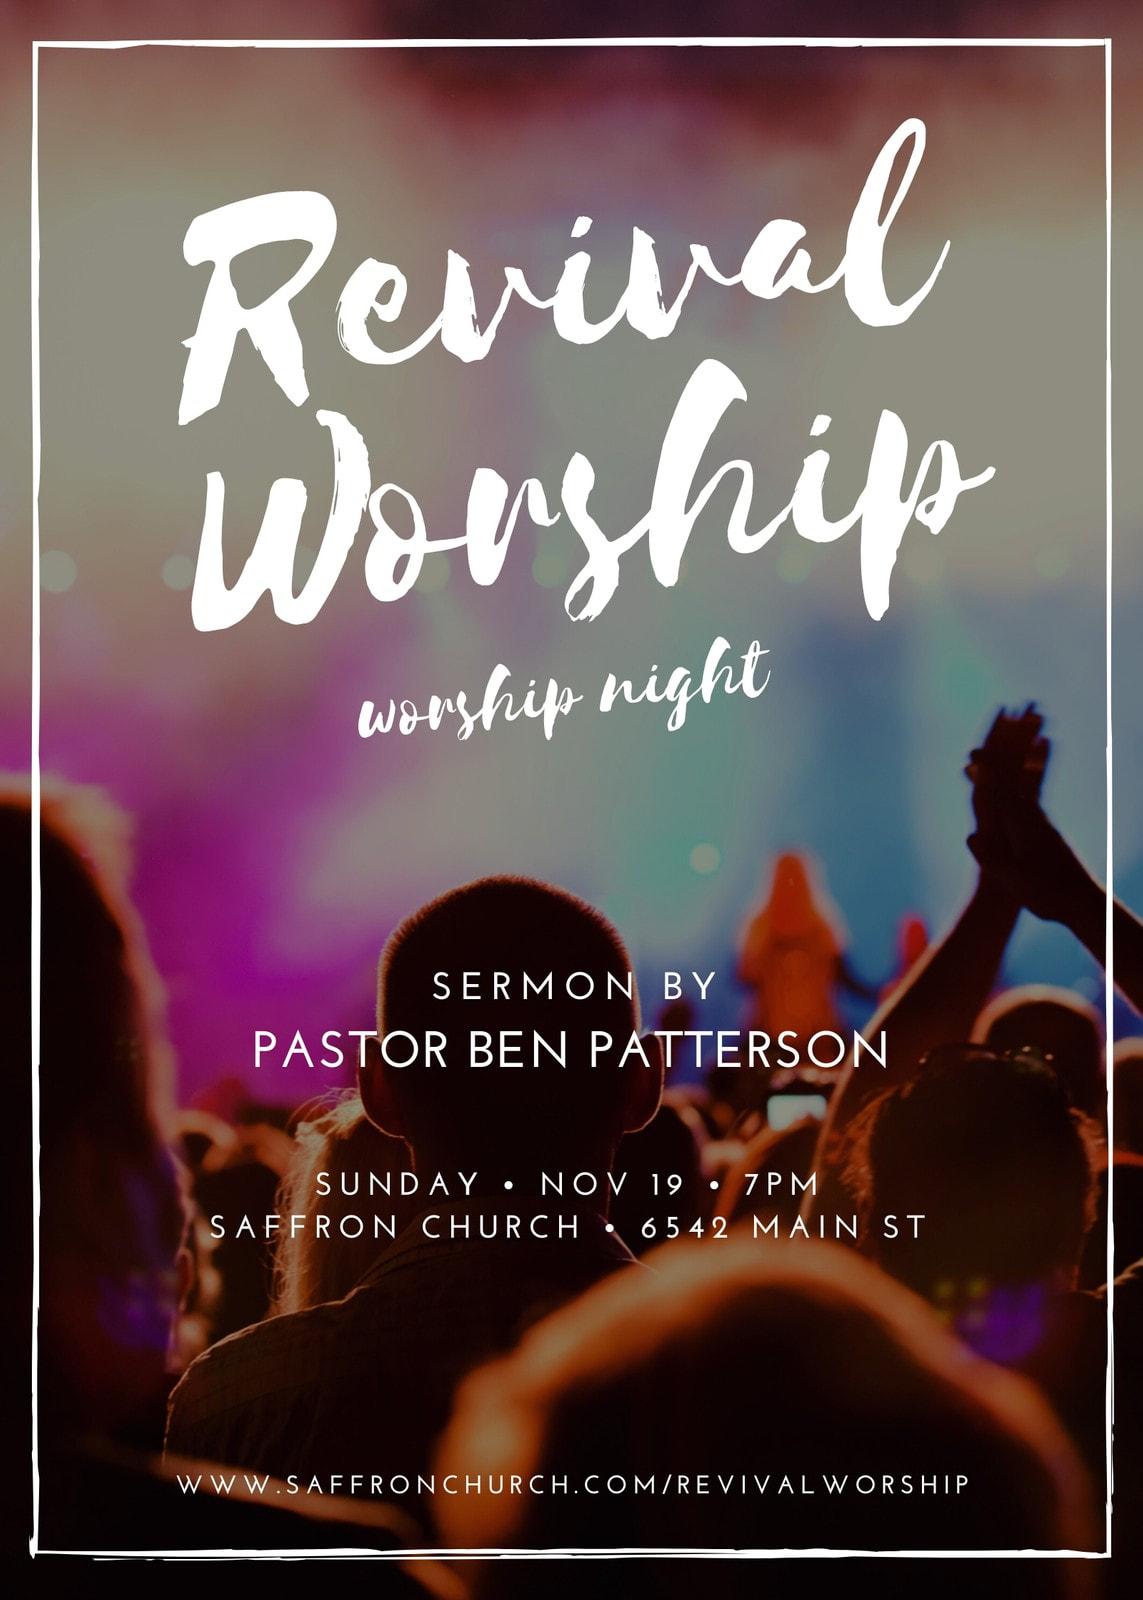 Revival Worship Church Event Flyer